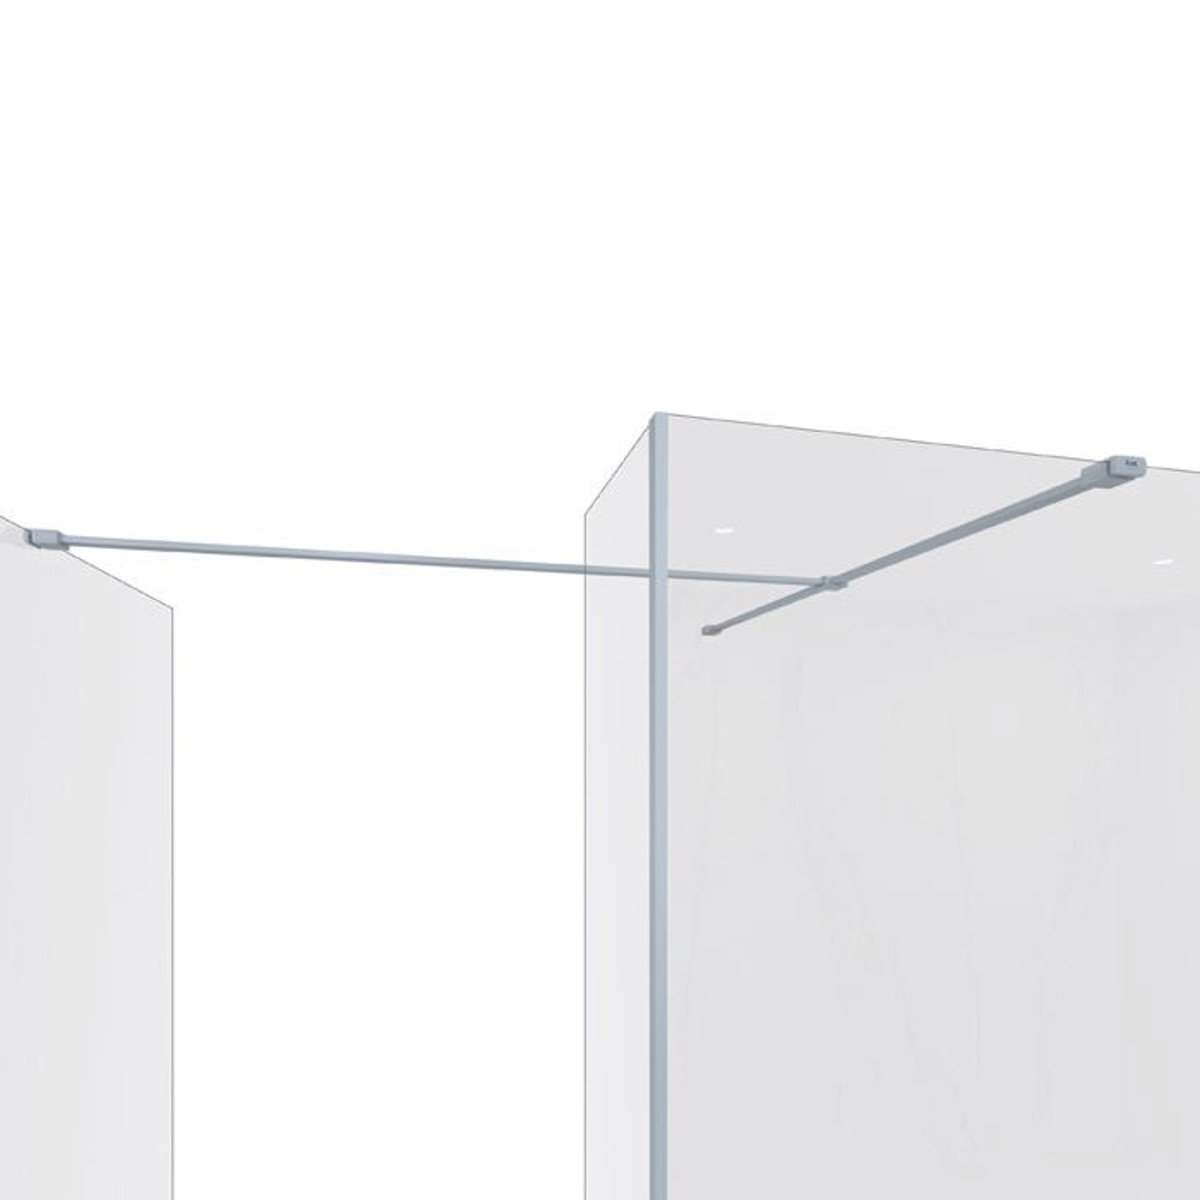 RAK Feeling Grey Bracing Kit with Side Panel Support